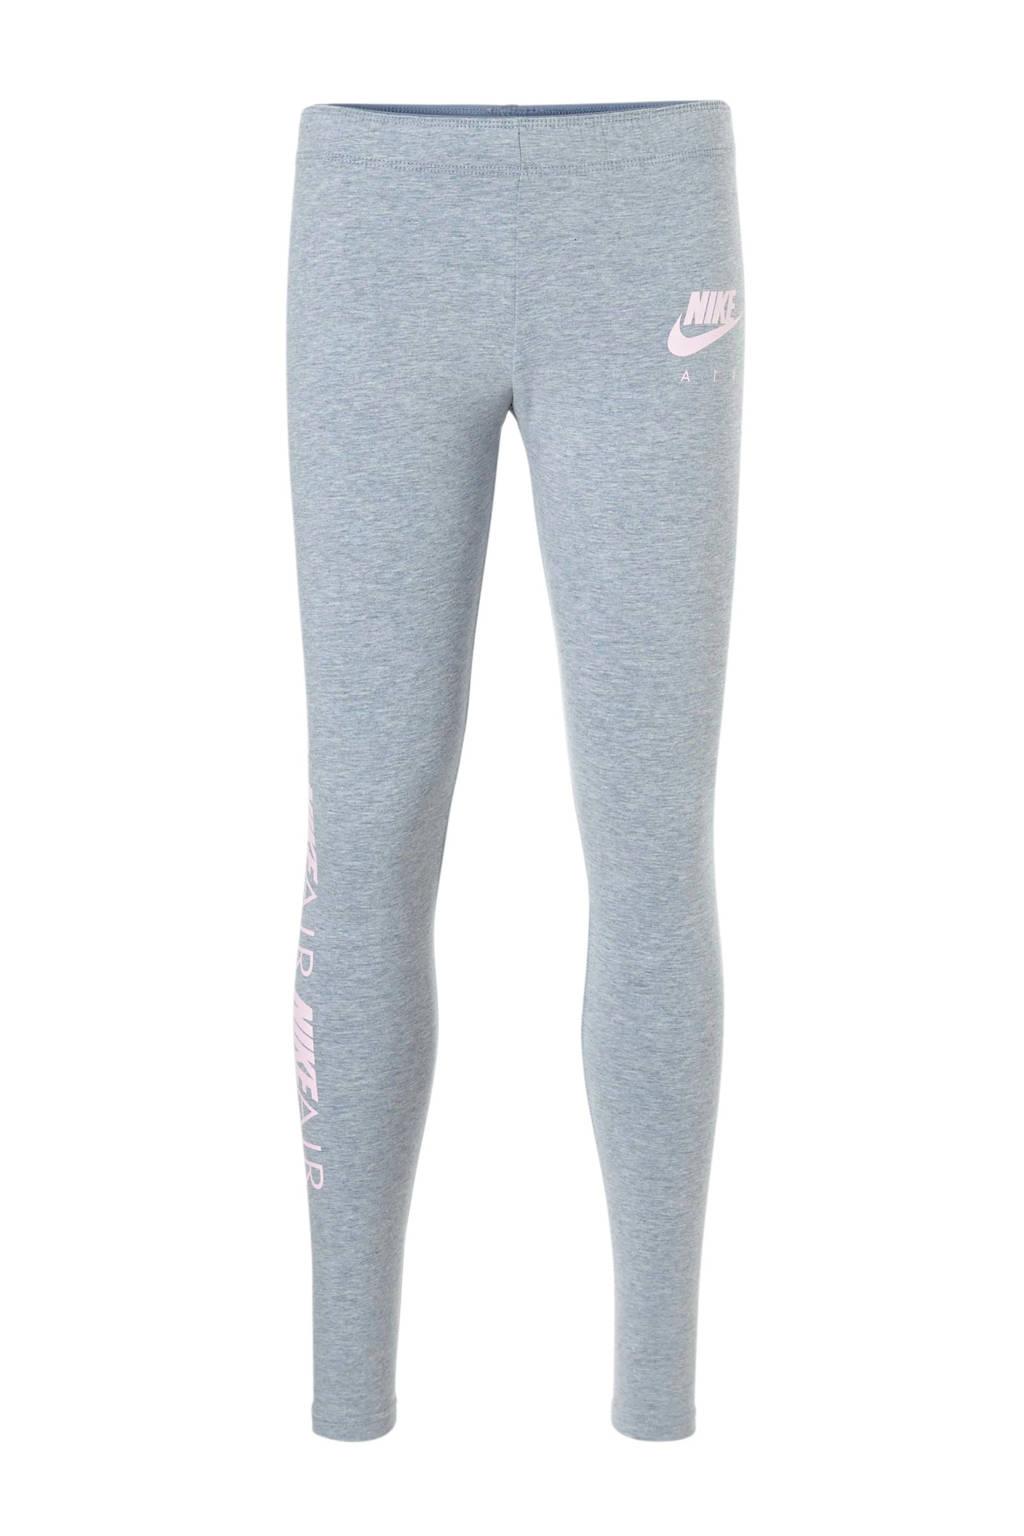 Nike legging grijs, Grijs melange/roze